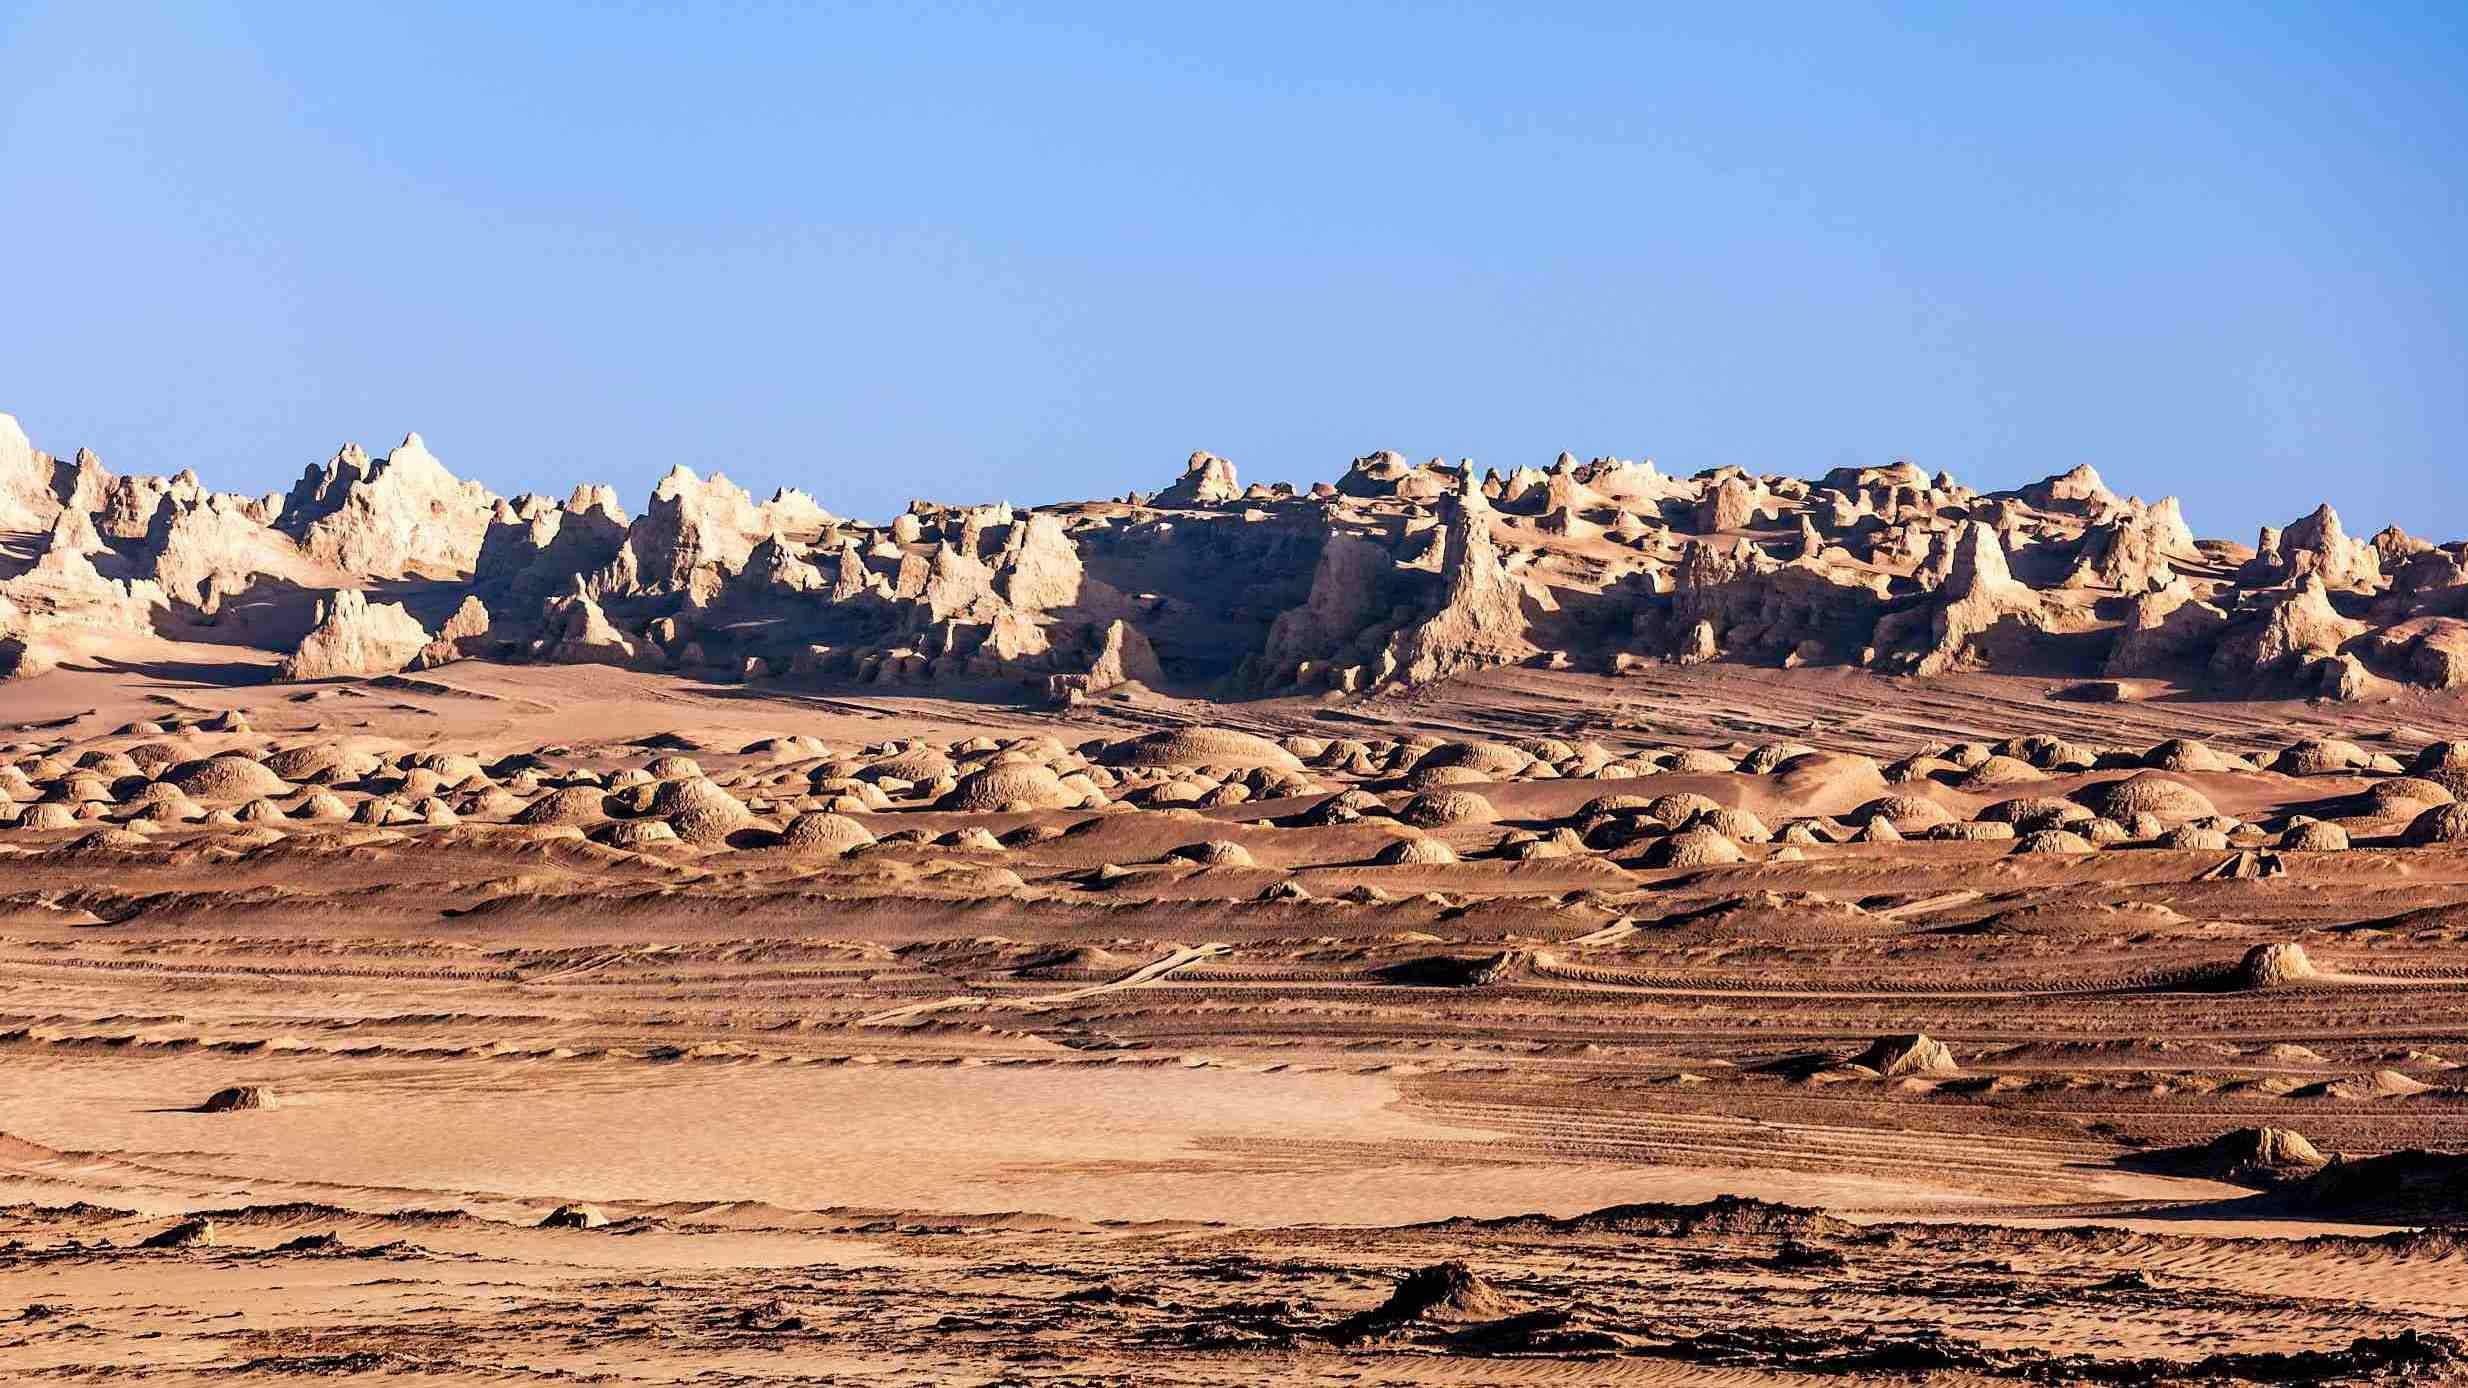 China to build first 'Mars Village' - CGTN